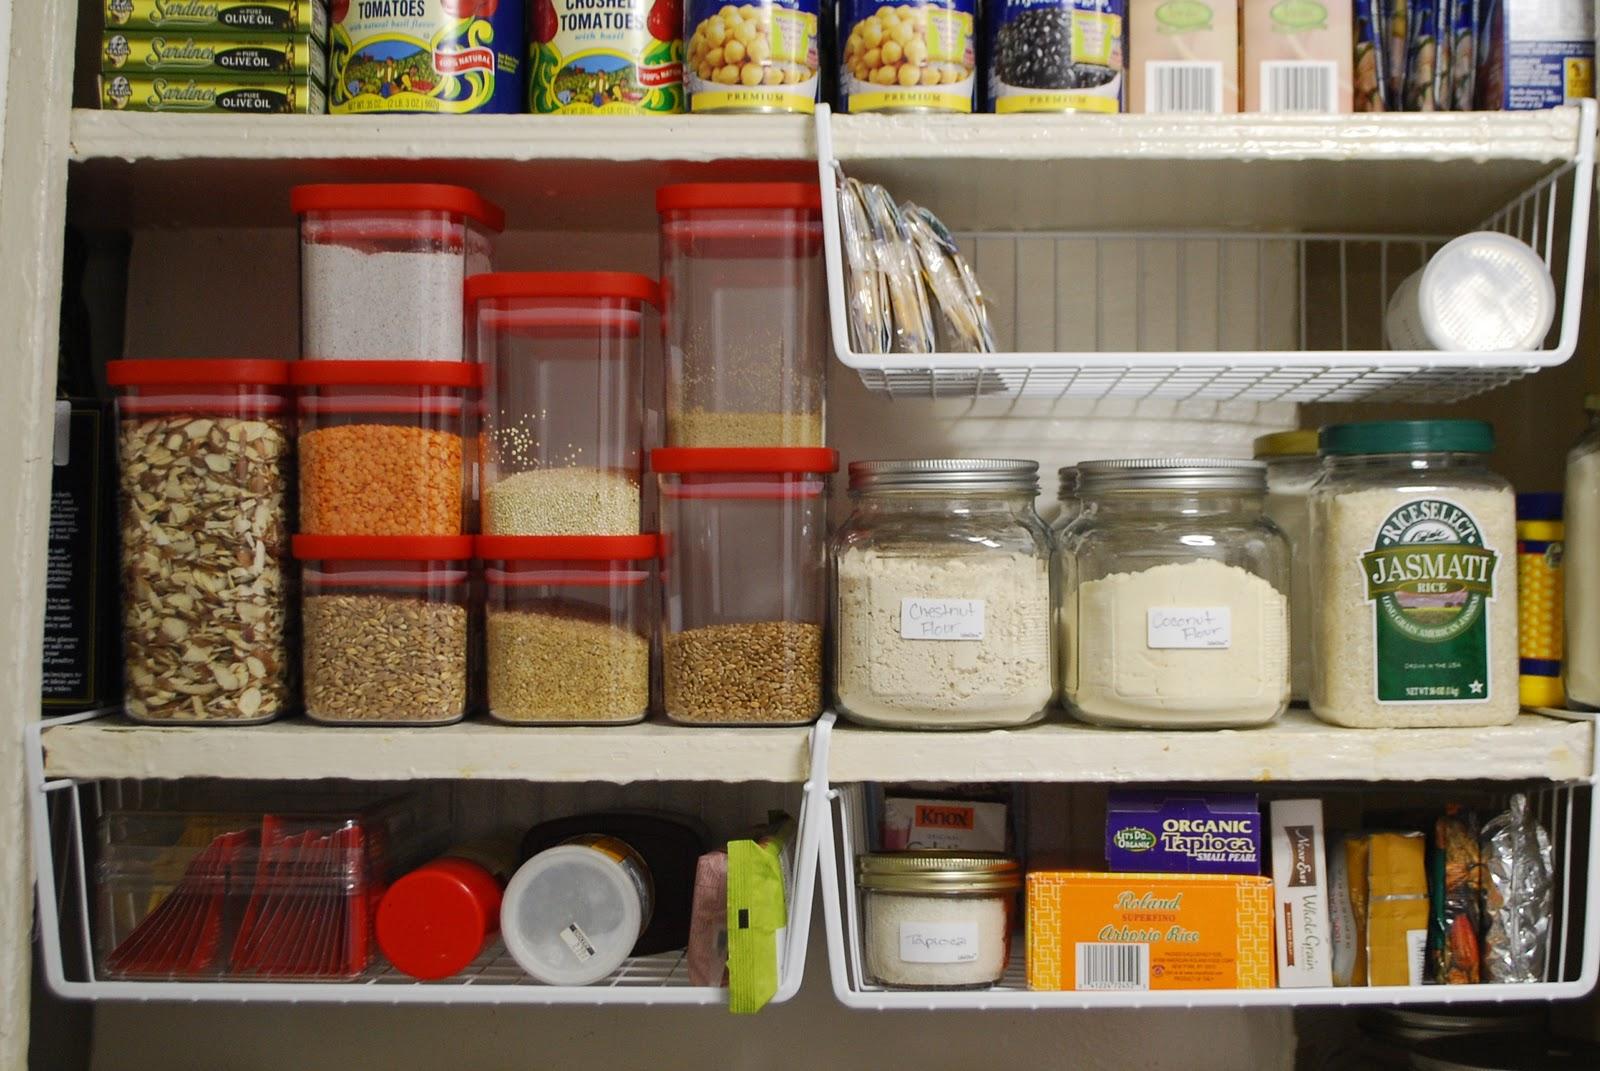 Organizing Kitchen Similiar Creative Kitchen Organizing Ideas Keywords